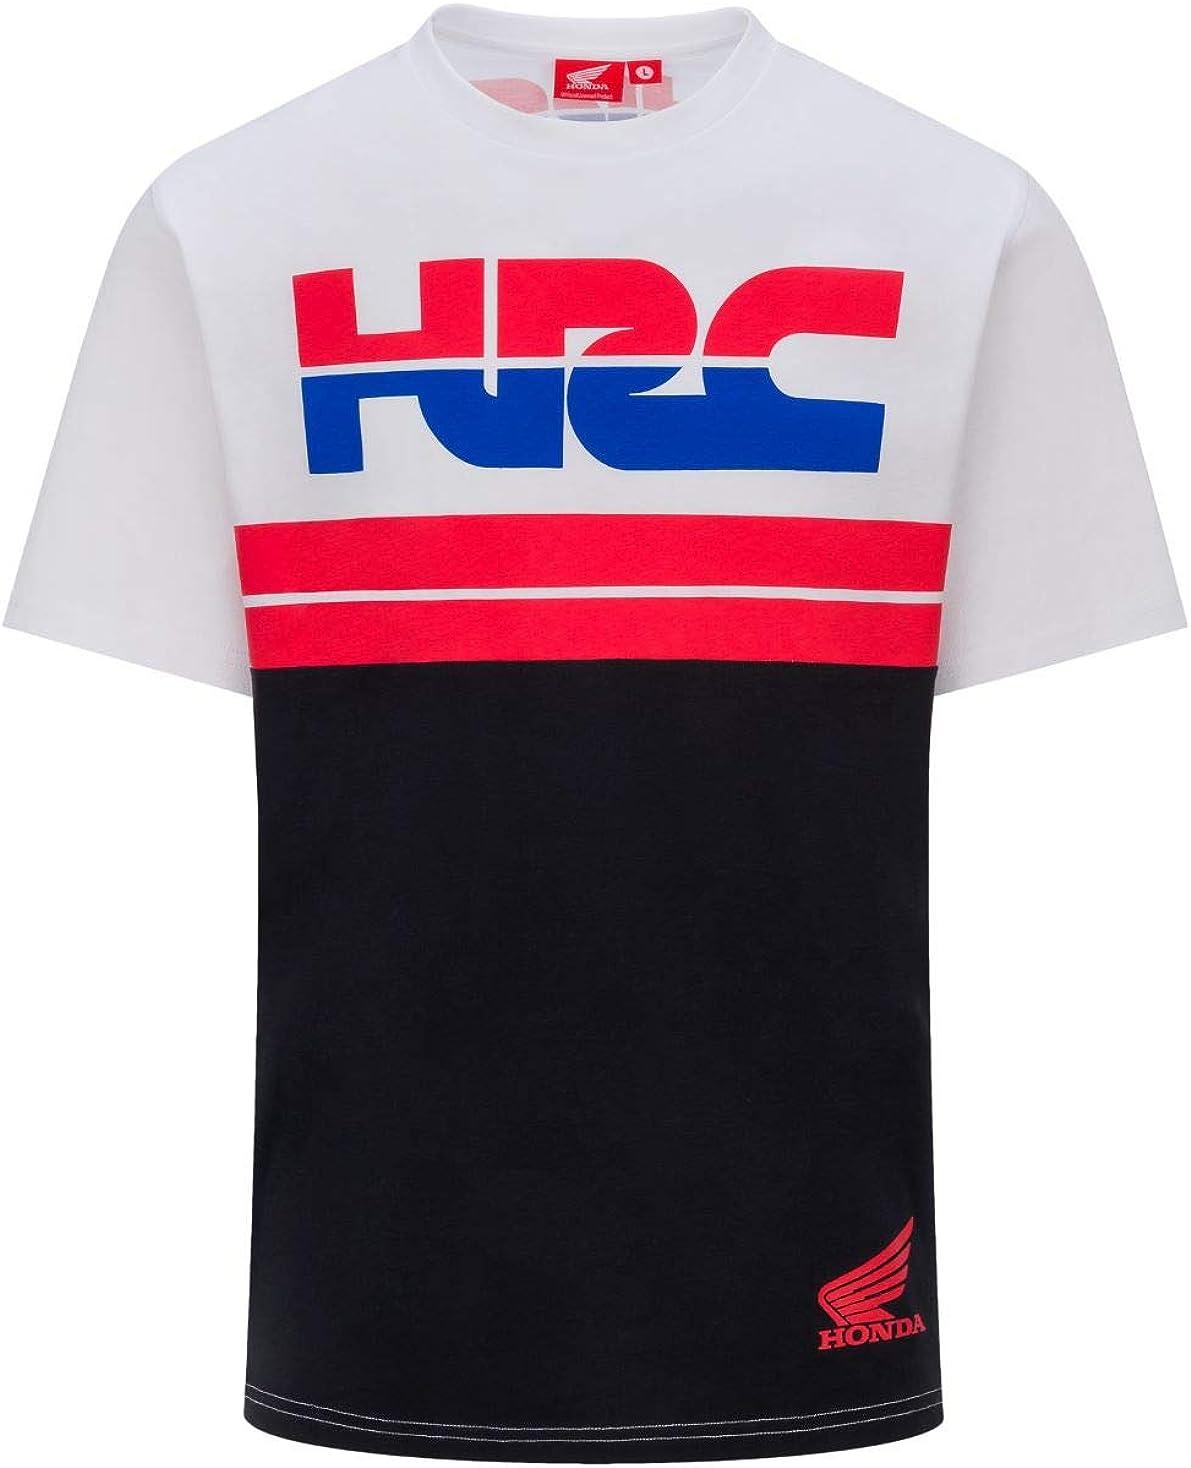 HRC RACING T-Shirt Team 2 Stripes Officiel MotoGP